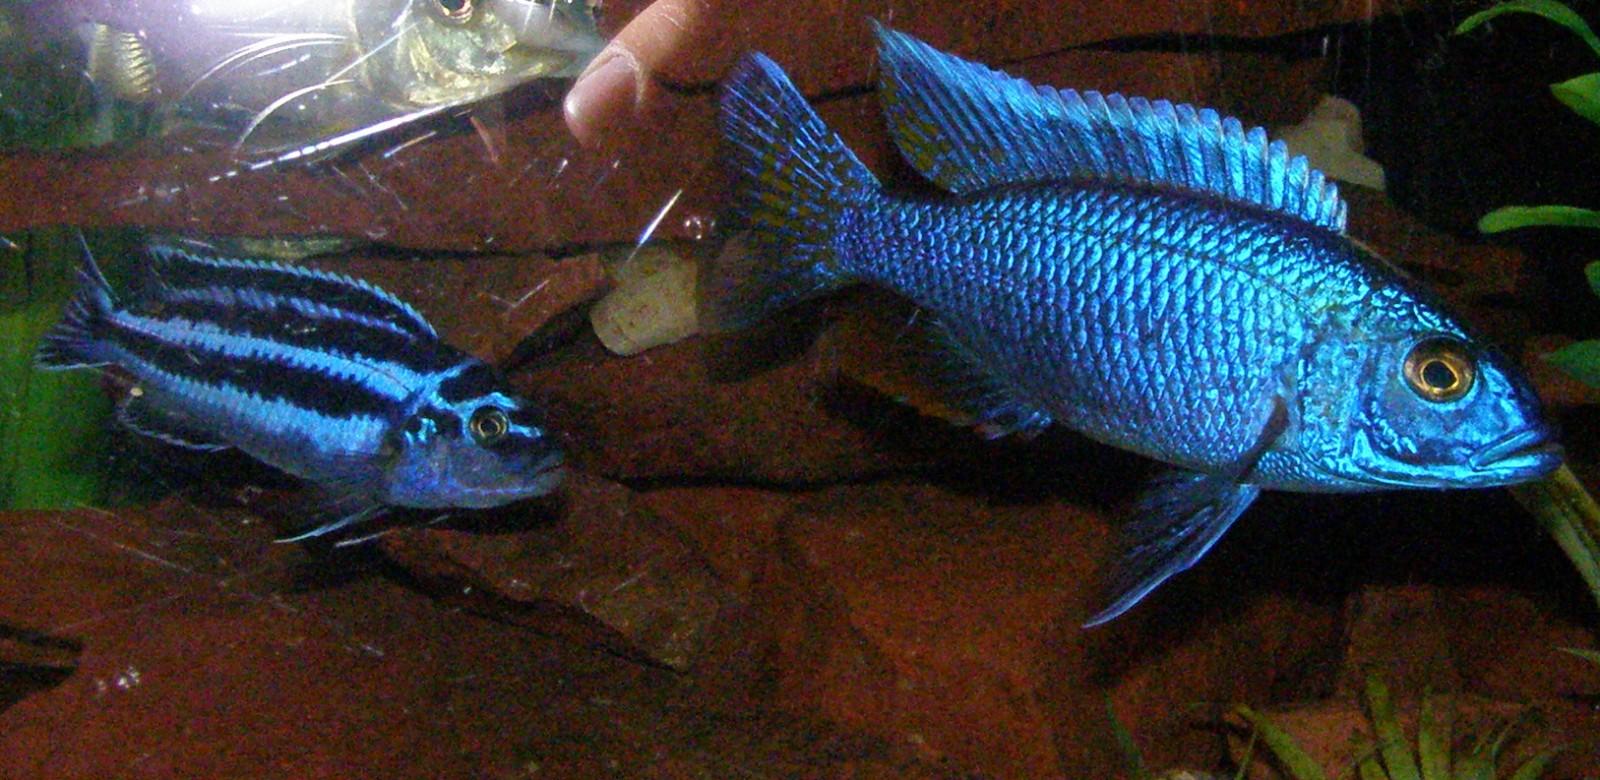 cichlids.com: Johanni and Electric Blue Hap